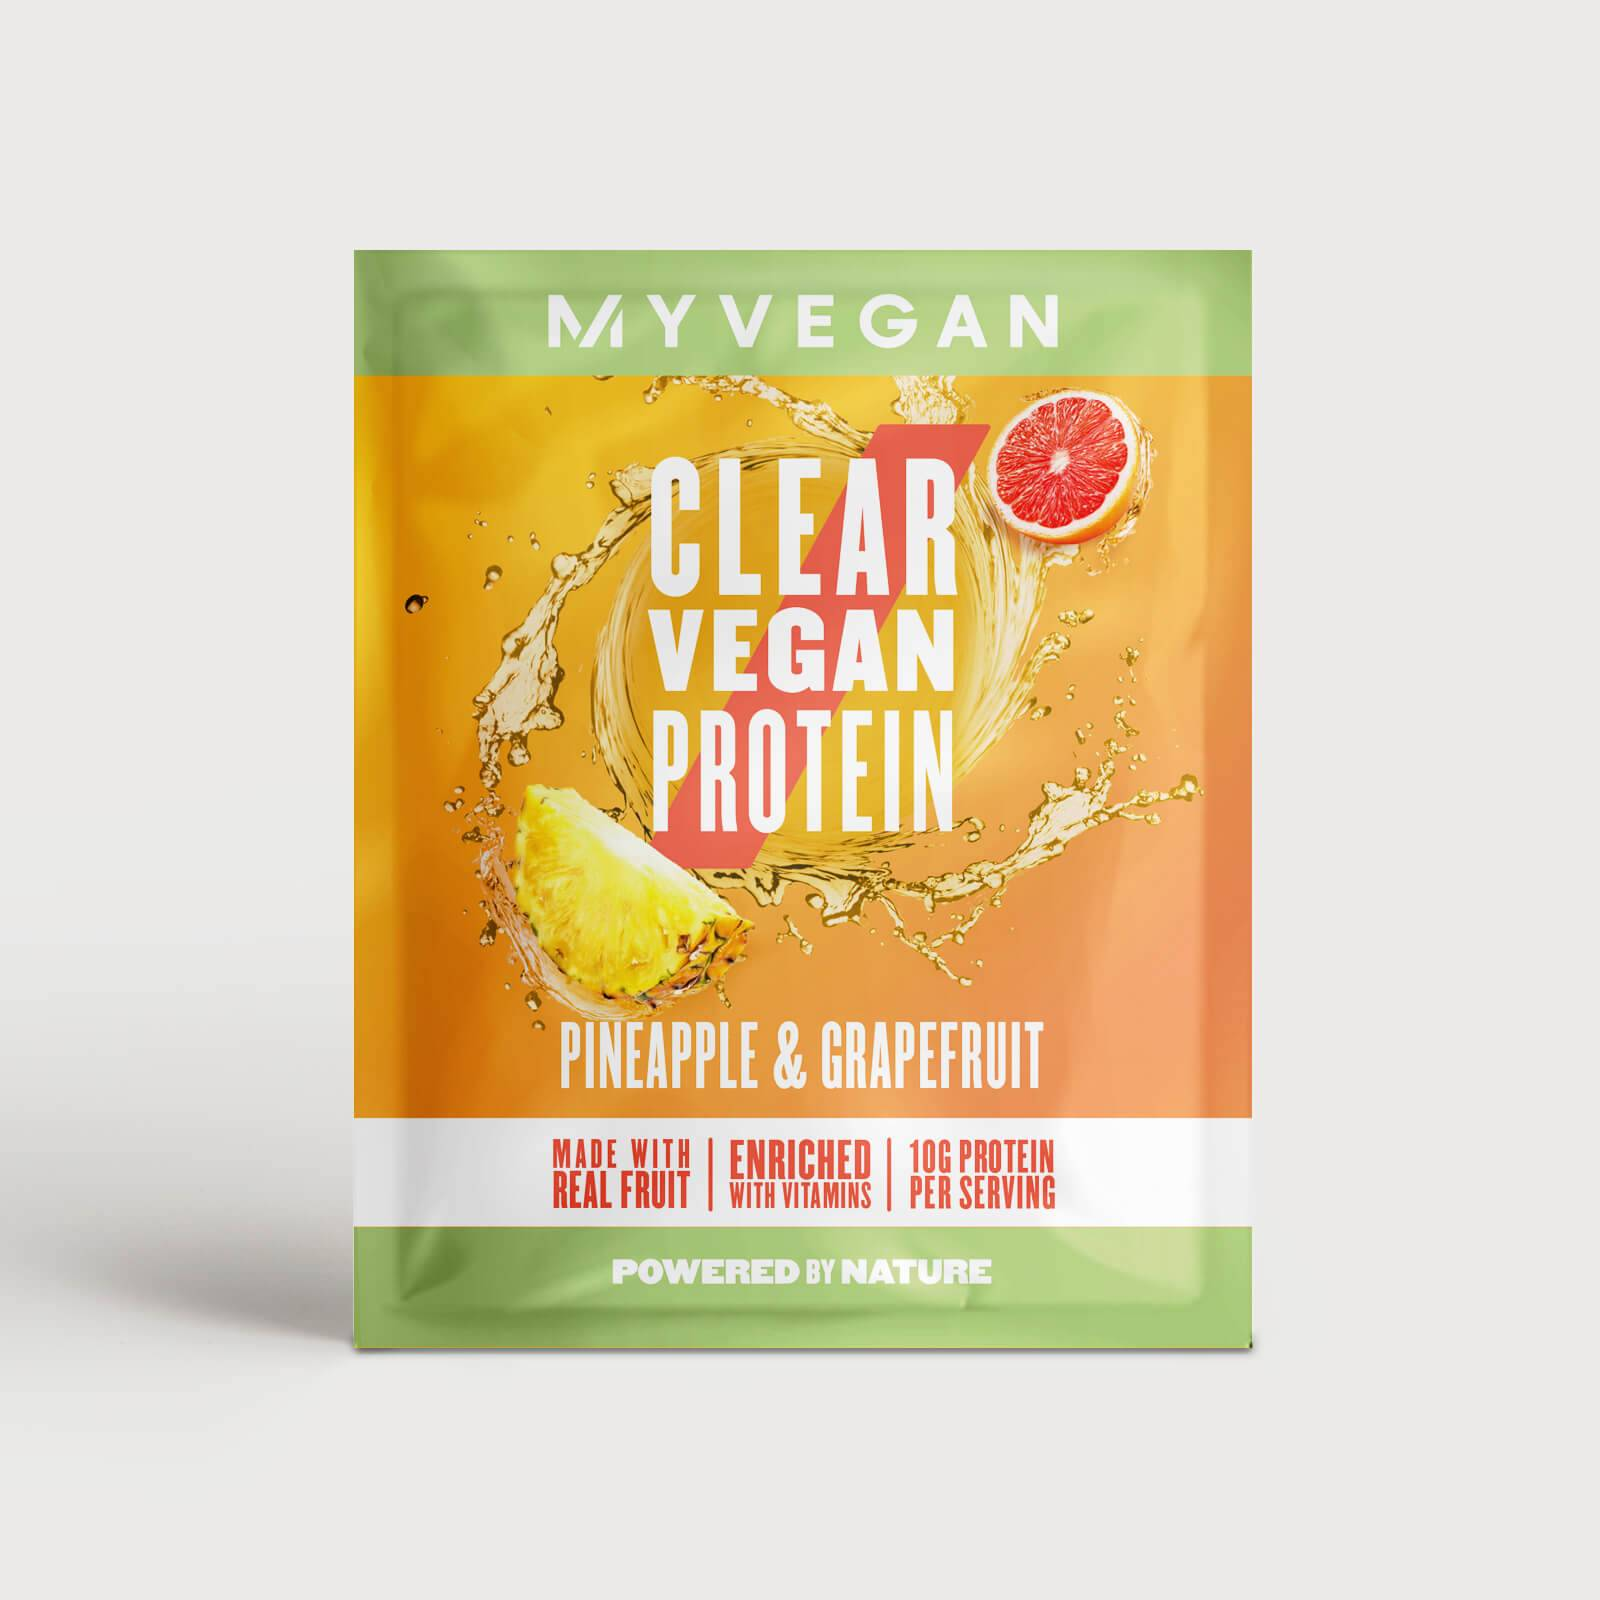 Myvegan Clear Vegan Protein, 16g (Sample) - Pineapple & Grapefruit